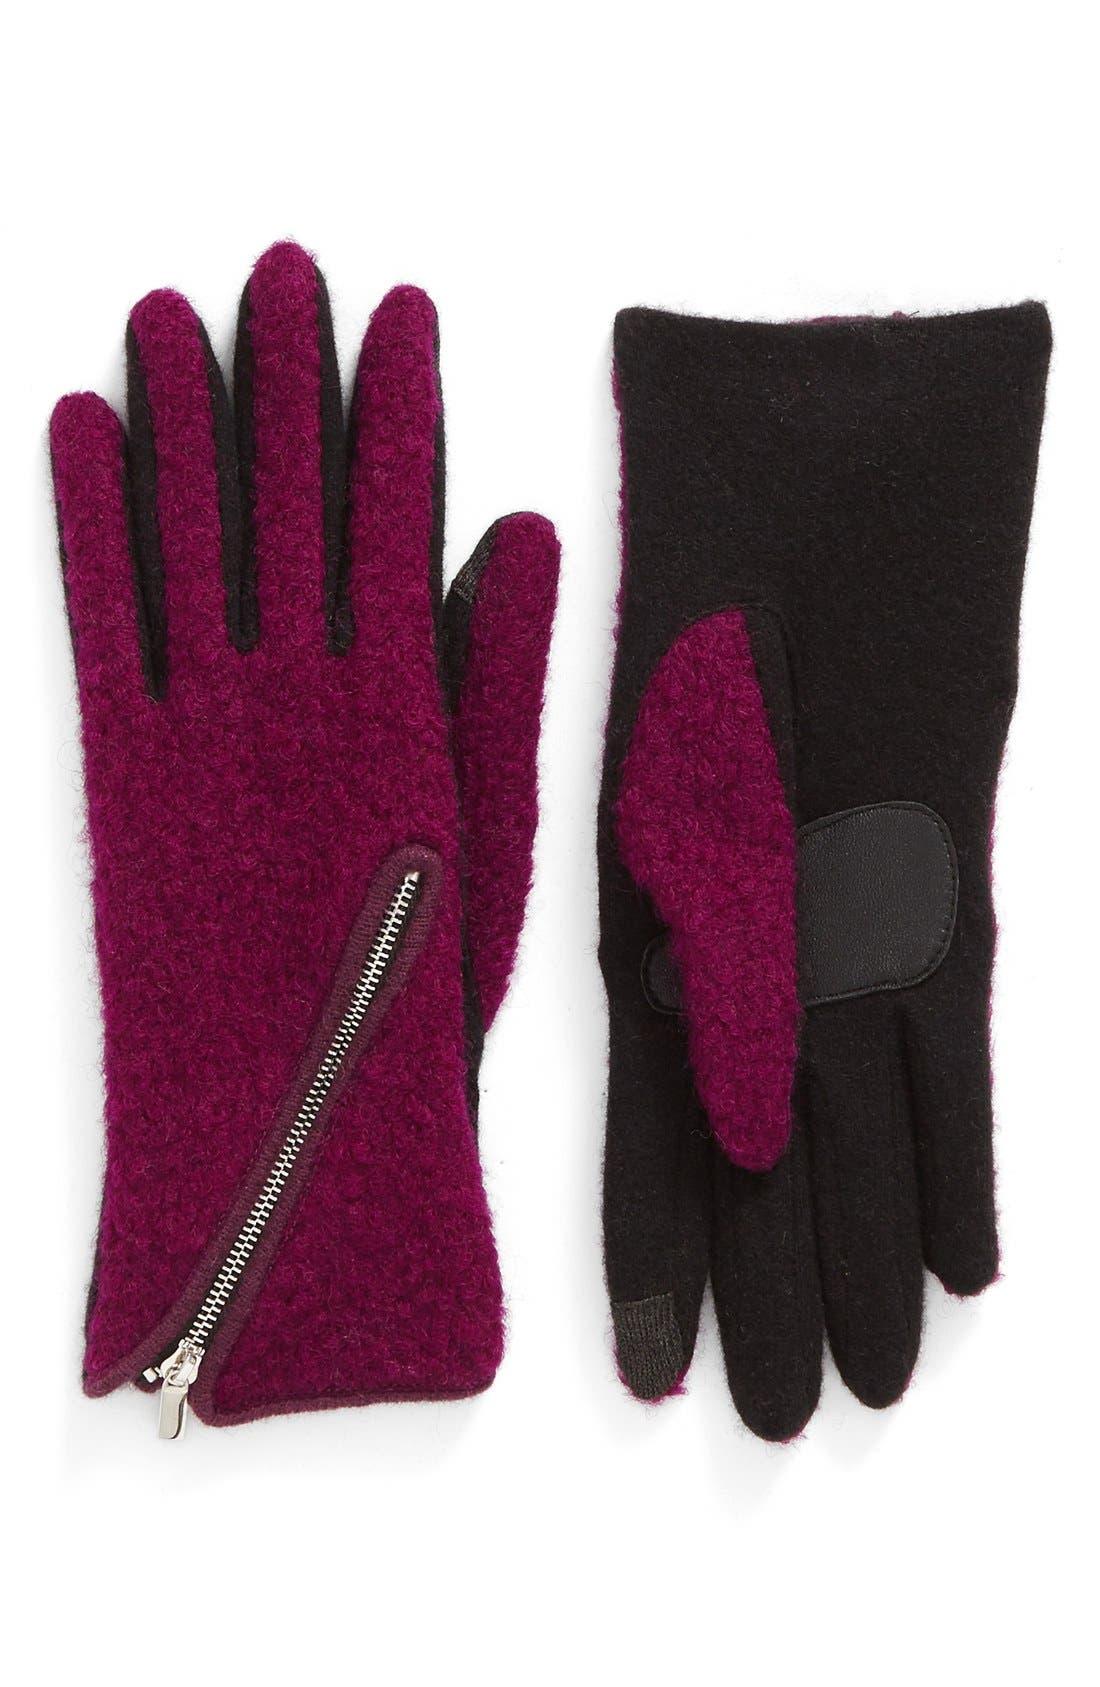 Alternate Image 1 Selected - Echo 'Touch - Zip Bouclé' Tech Gloves